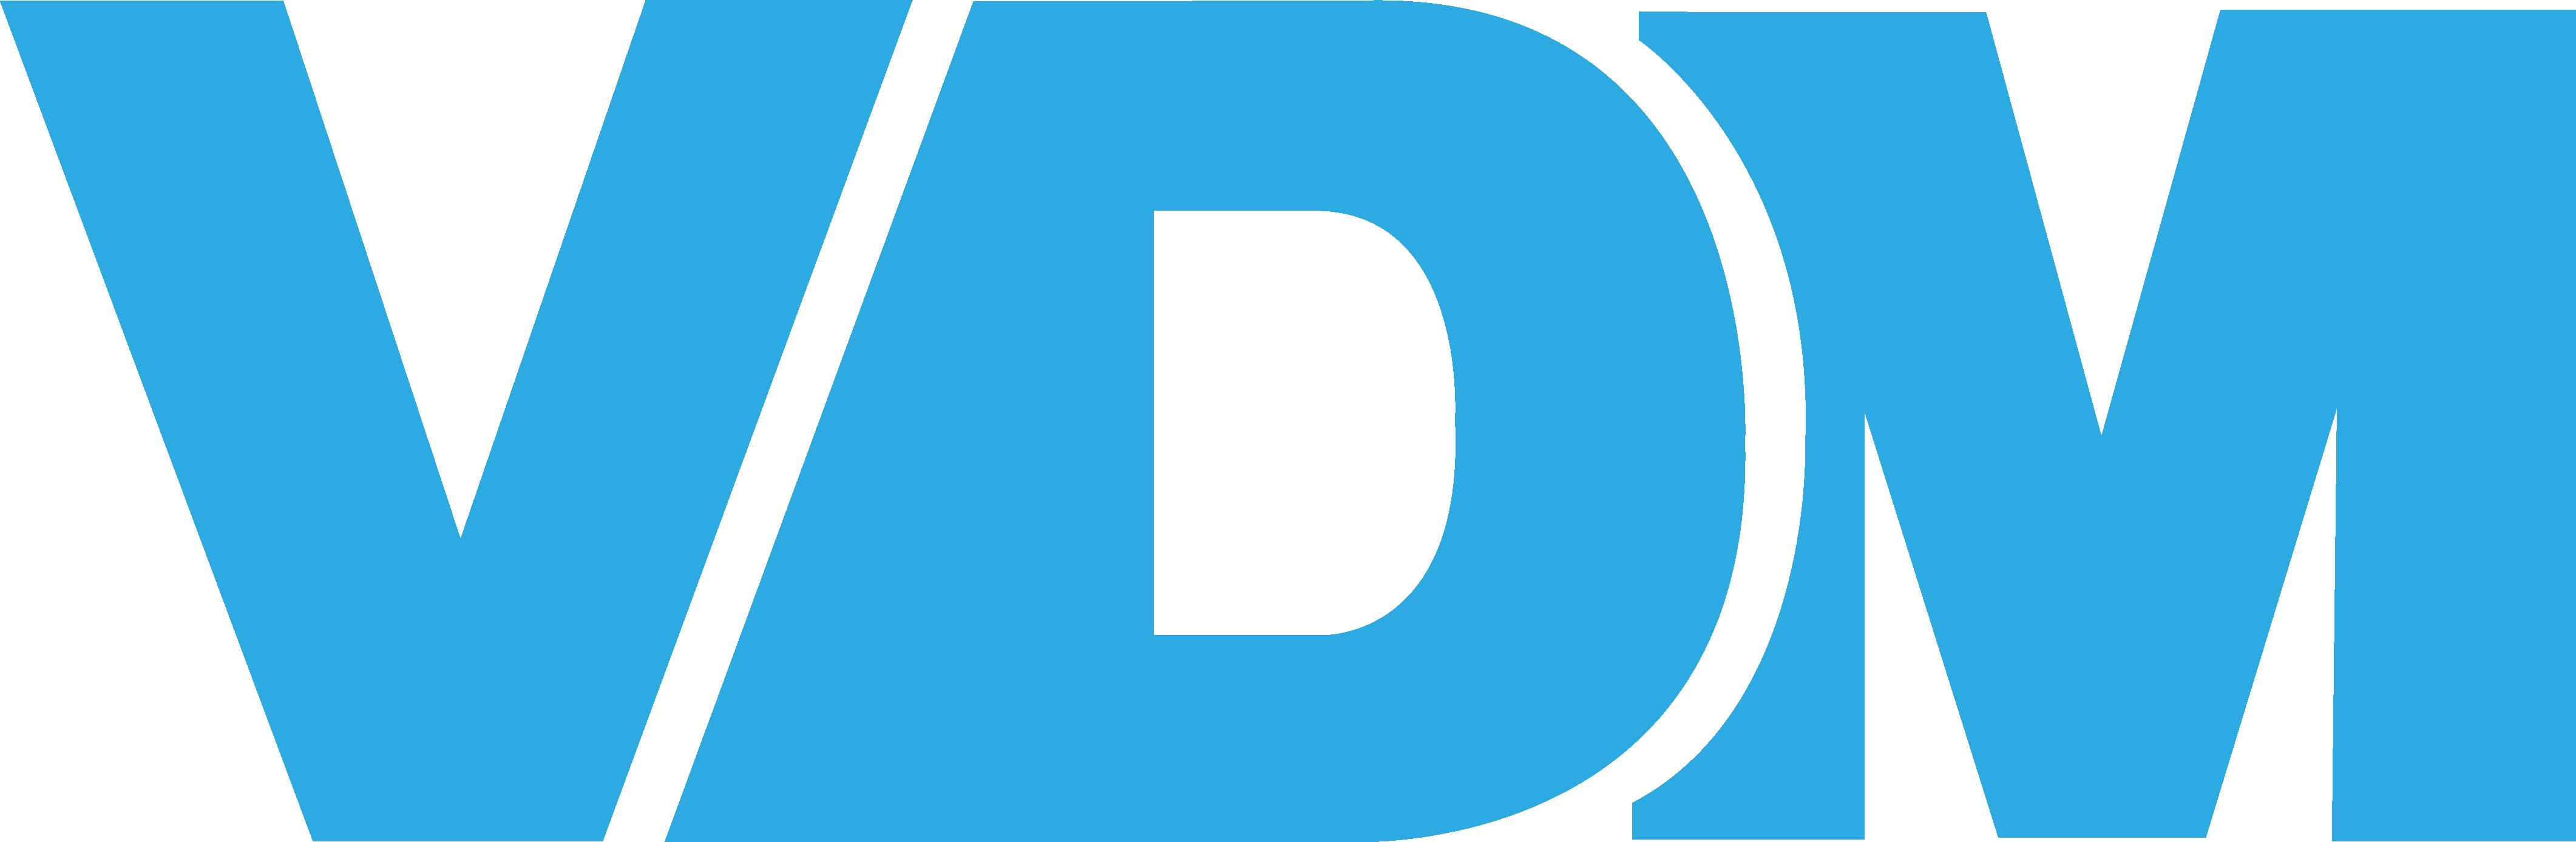 VDM Officiel messages sticker-0